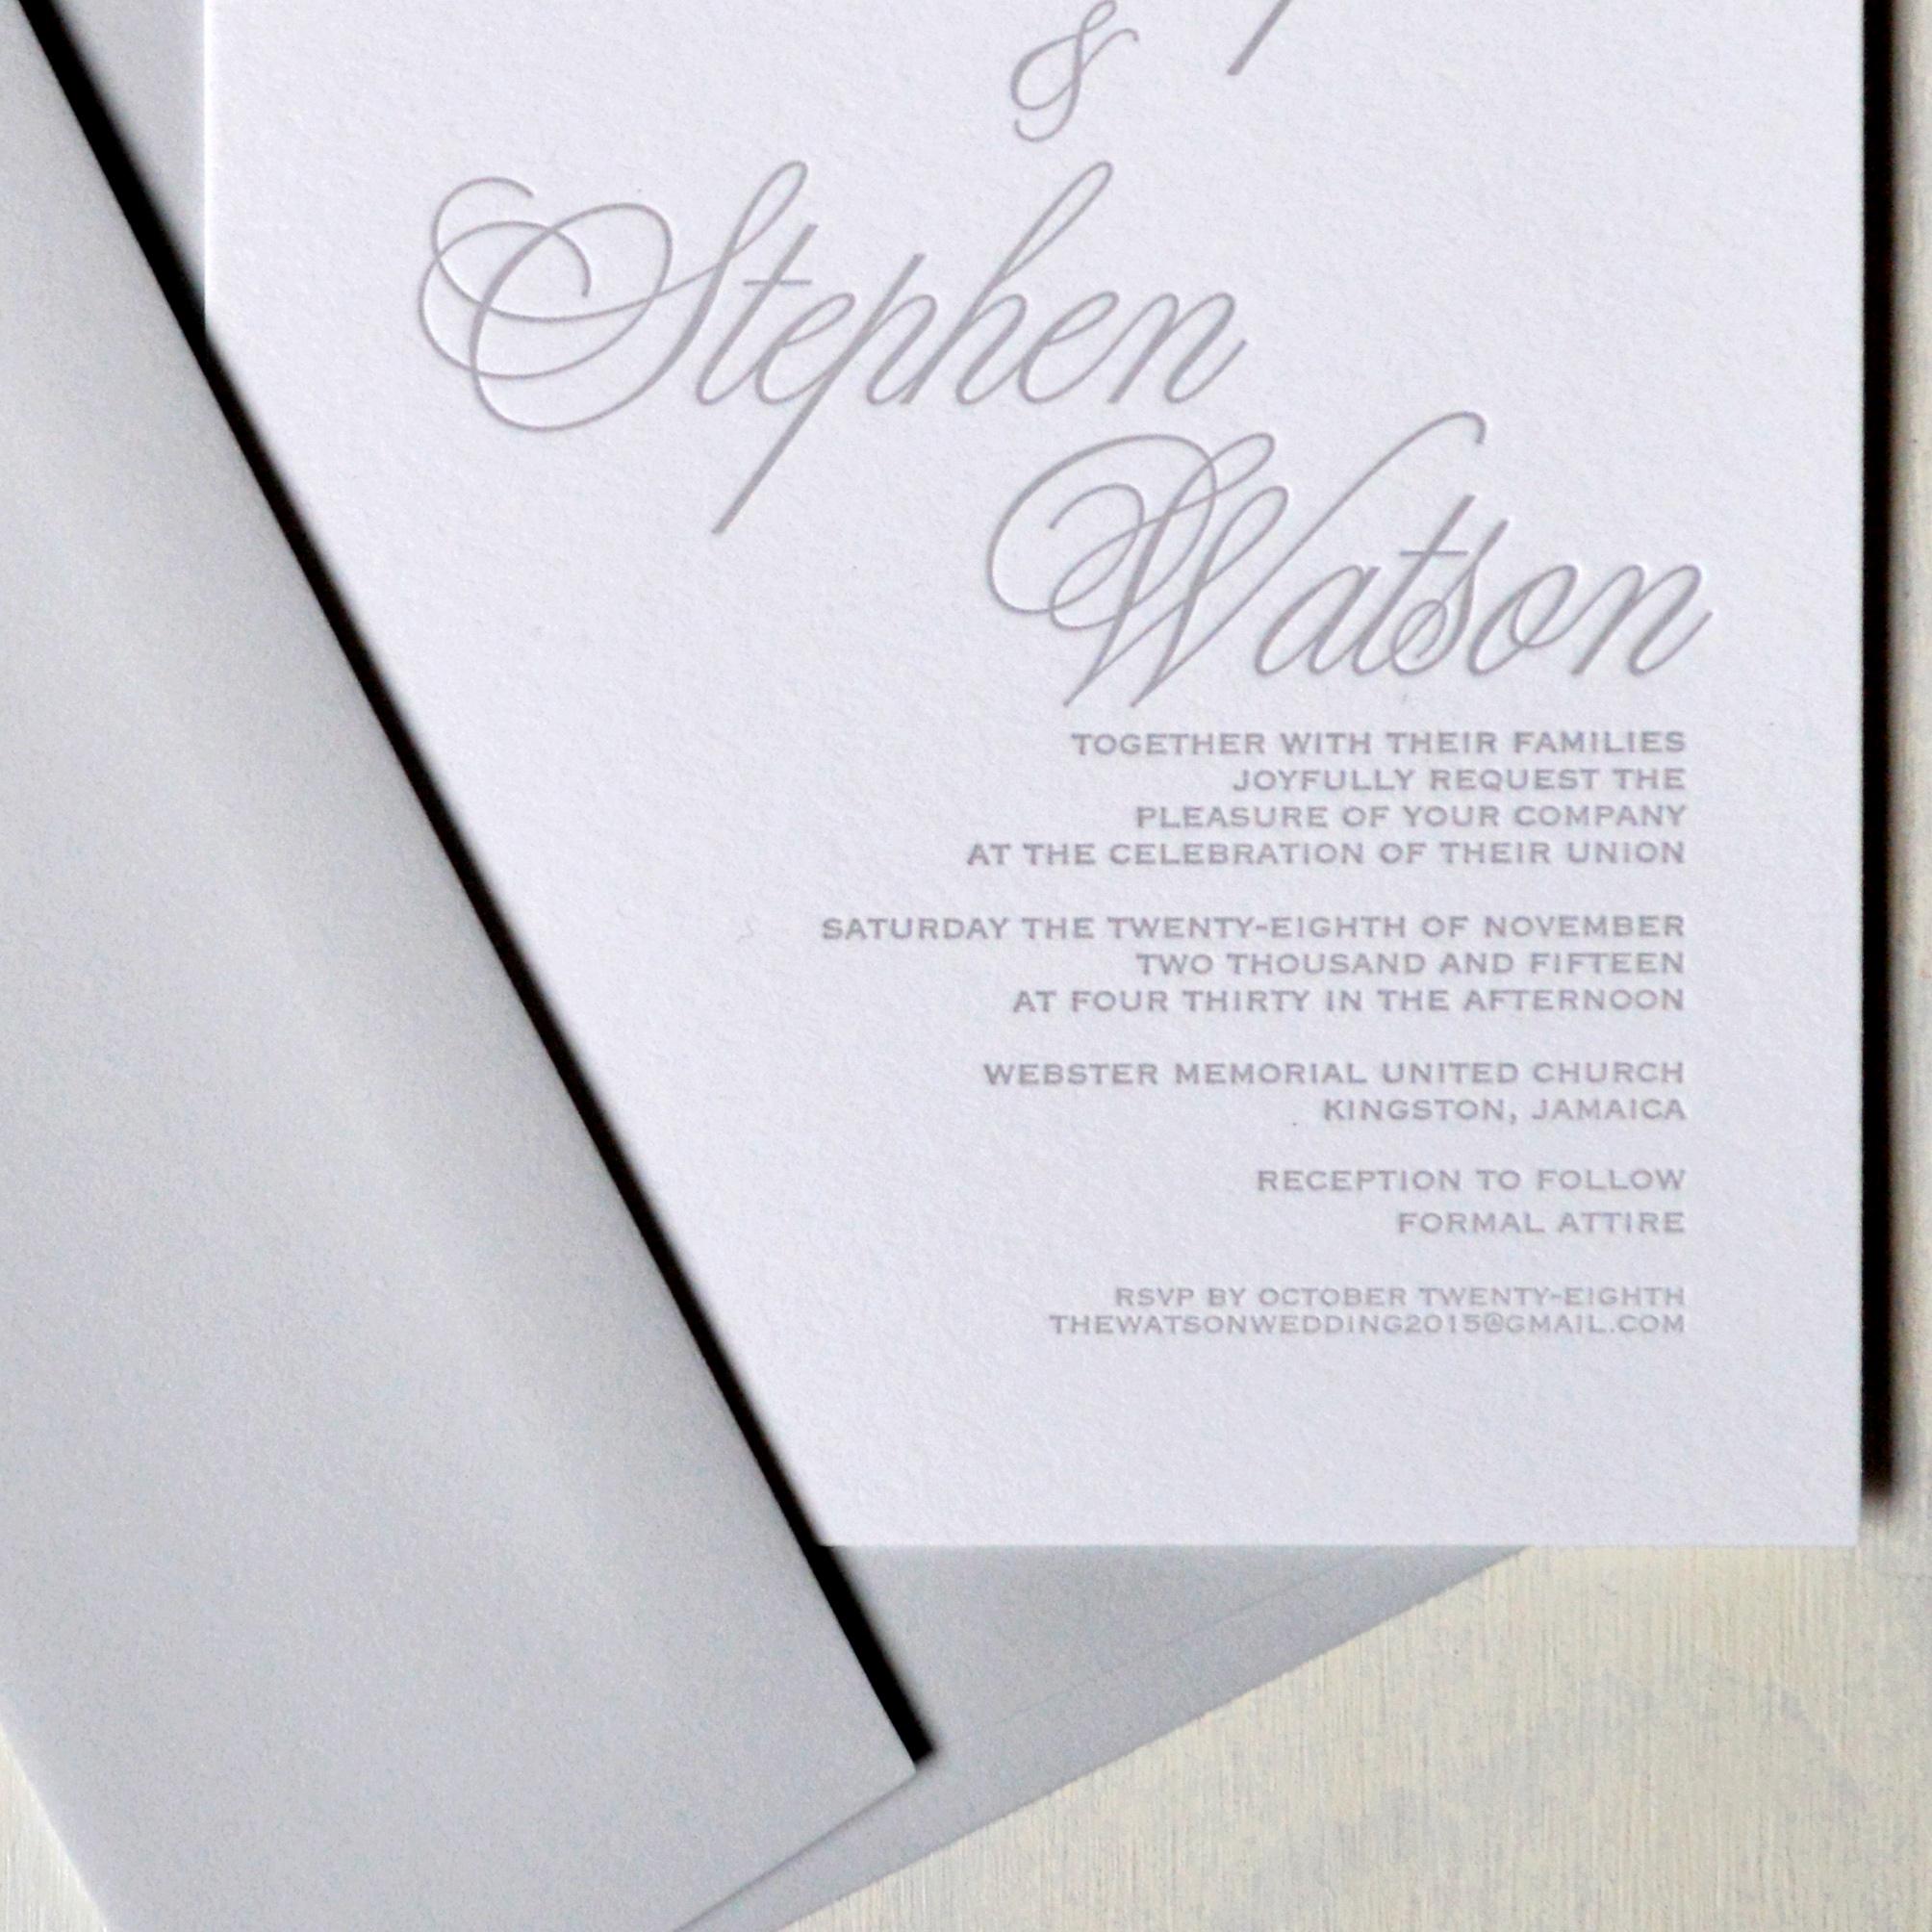 N&S Letterpress wedding invitation 3.jpg